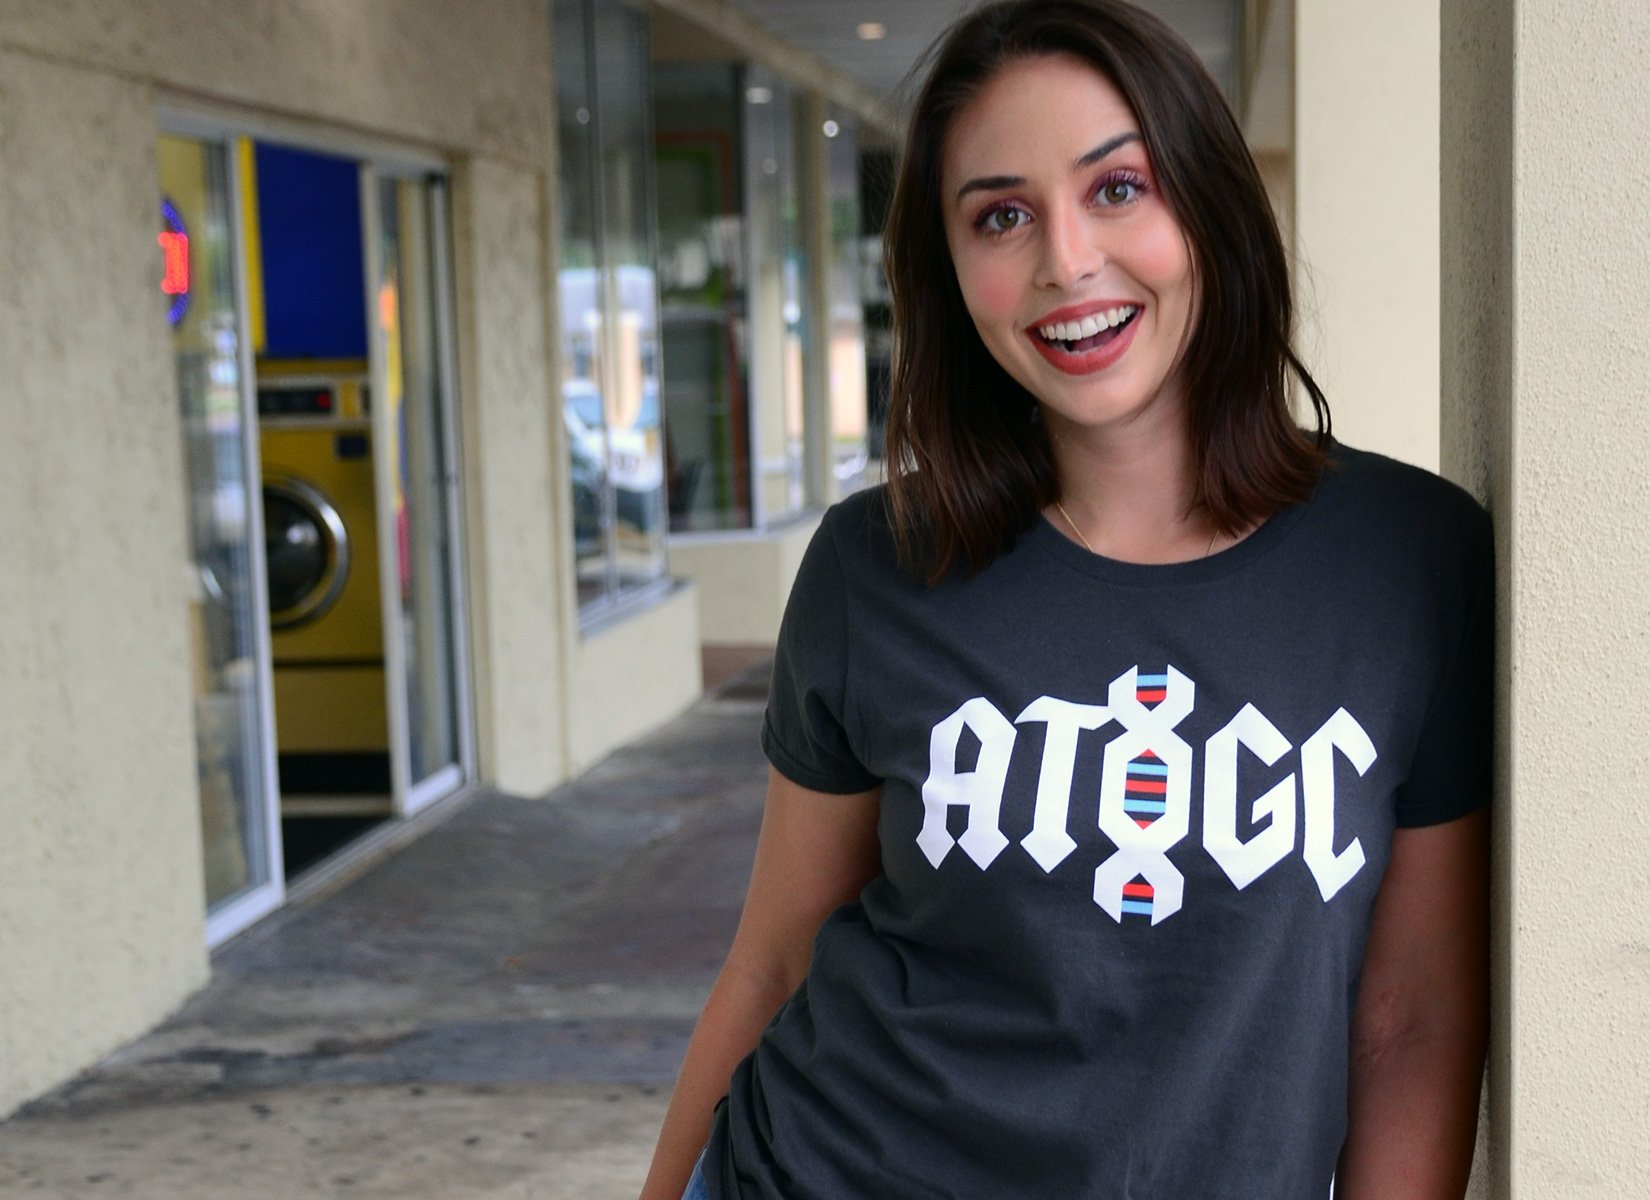 ATGC DNA on Womens T-Shirt